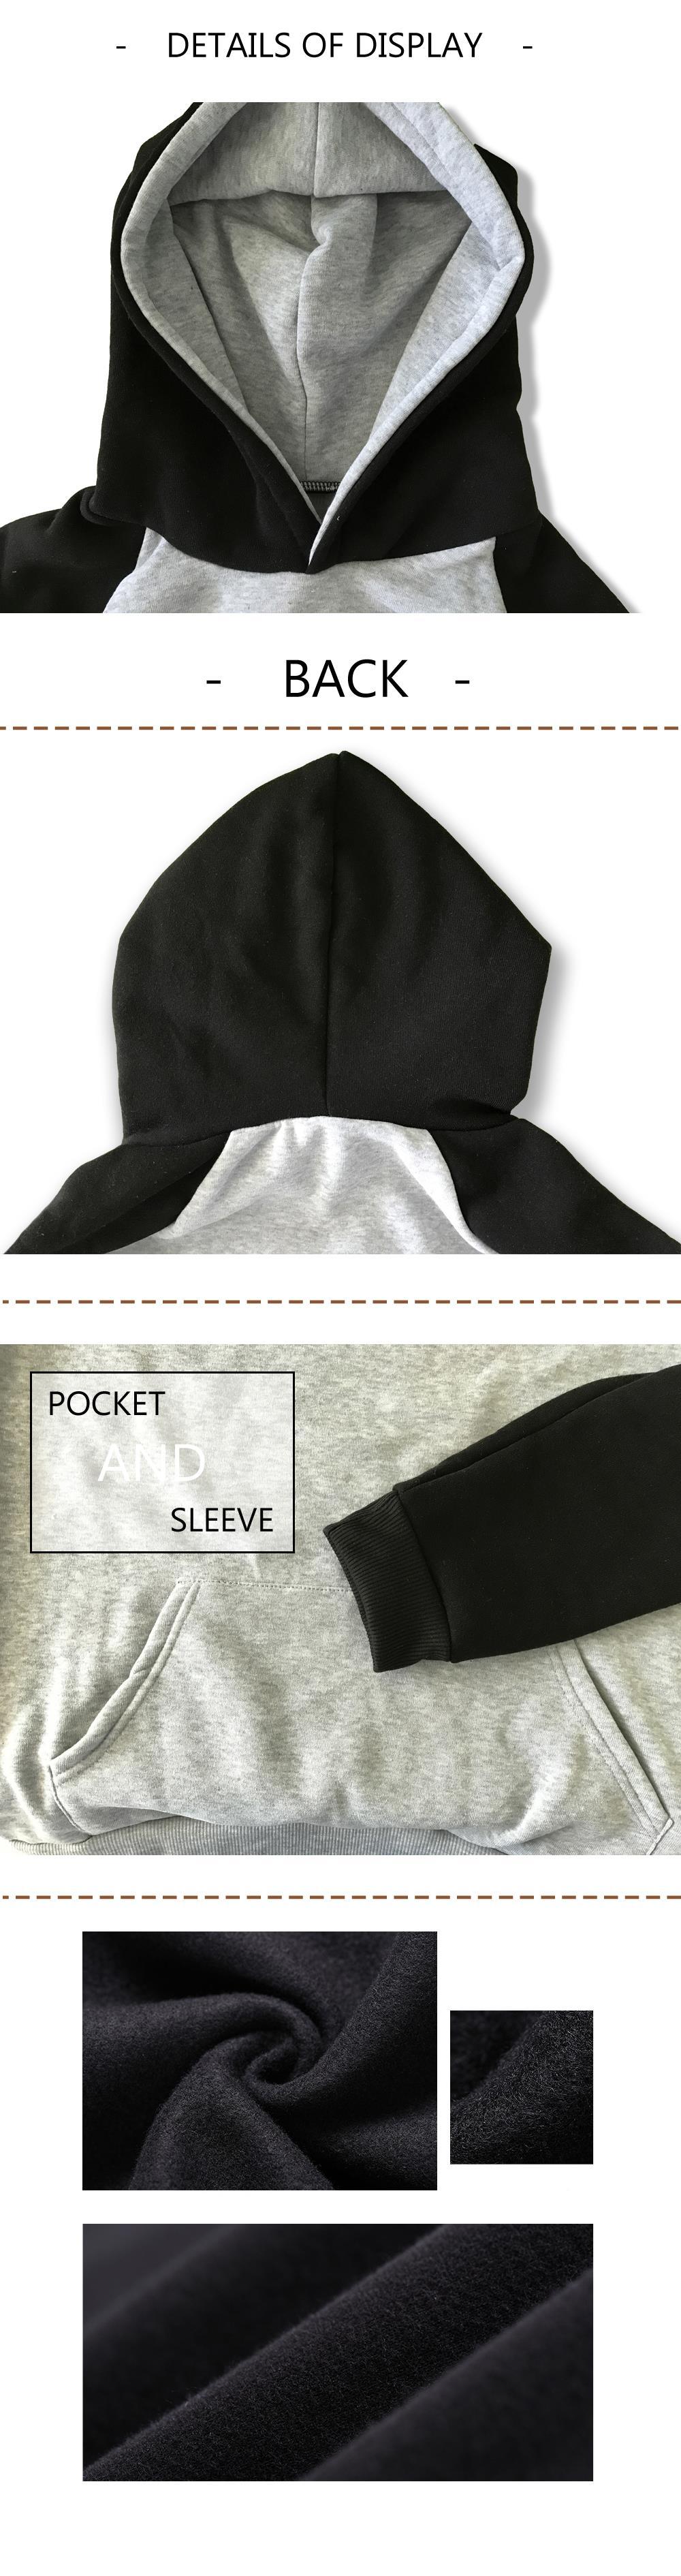 2017 Autumn Winter Fleece Women's Sportswear Harajuku Print CAT PAWS Cartoon Kawaii K-pop Clothing Streetwear Hoodies Sweatshirt CAT PAWS Cartoon Hoodie HTB1MqBfaDZRMeJjSspnq6AJdFXaB